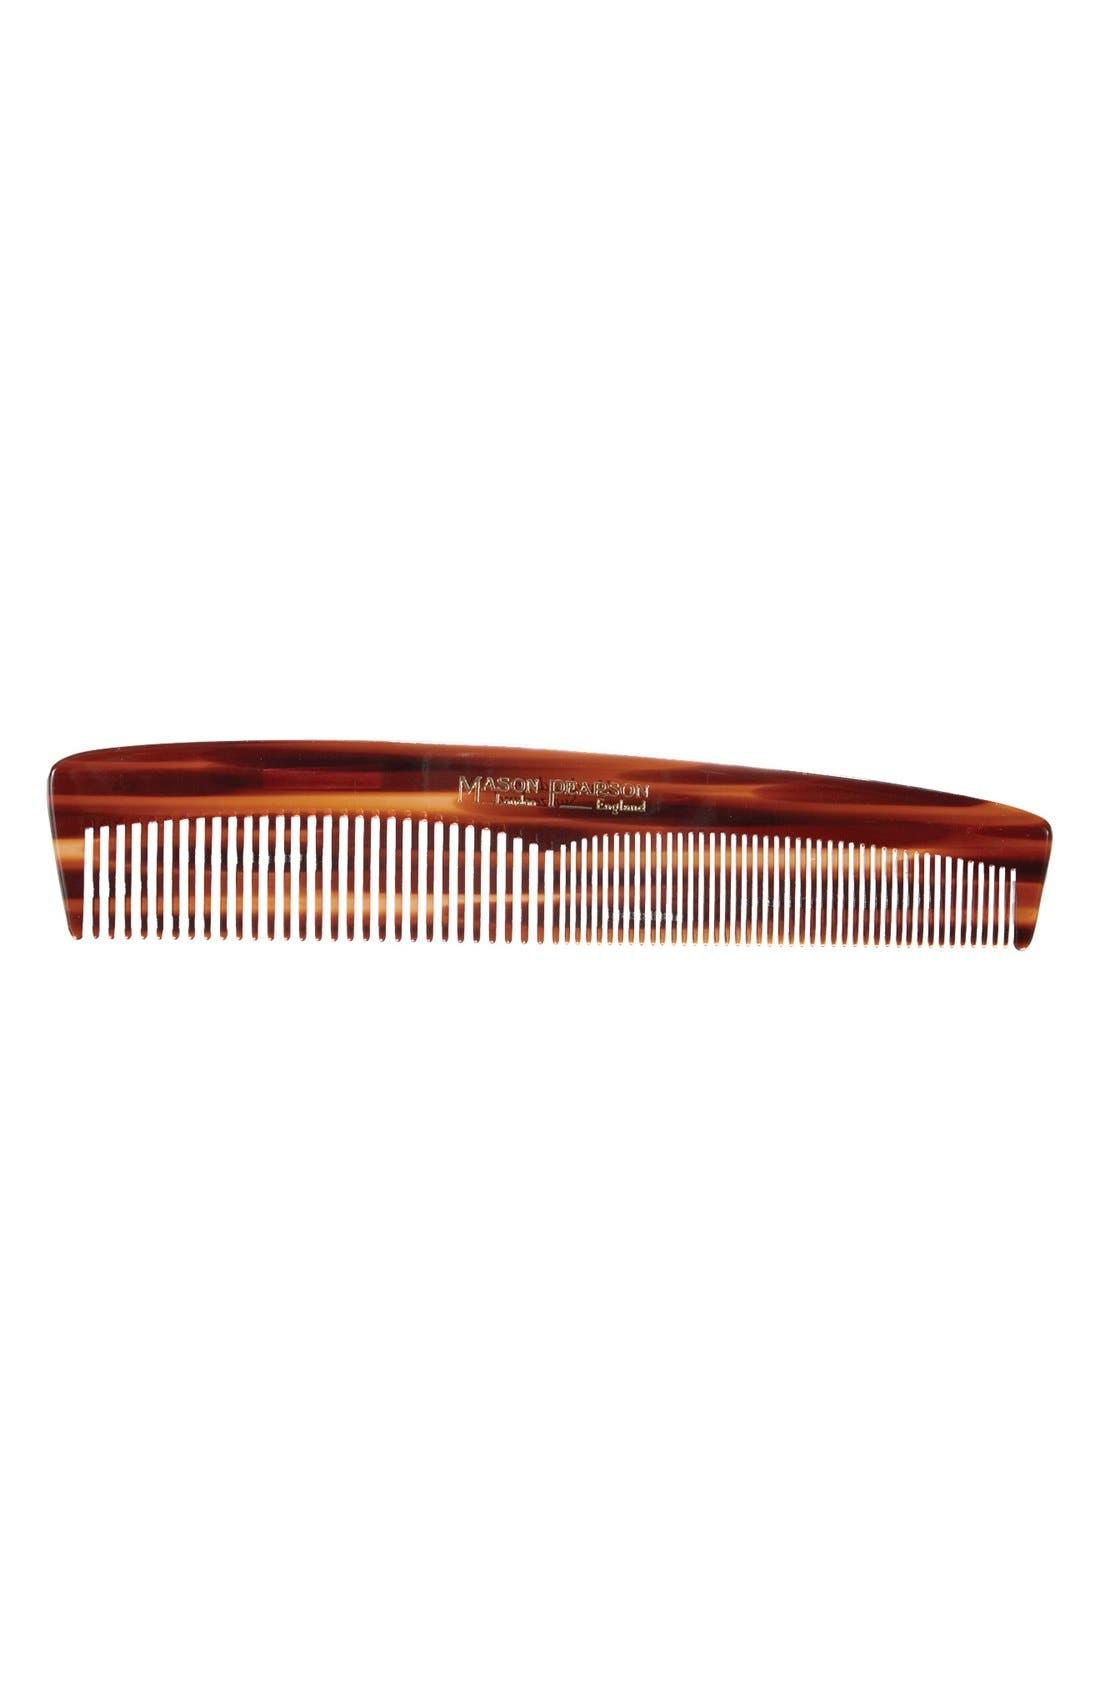 Main Image - Mason Pearson Styling Comb